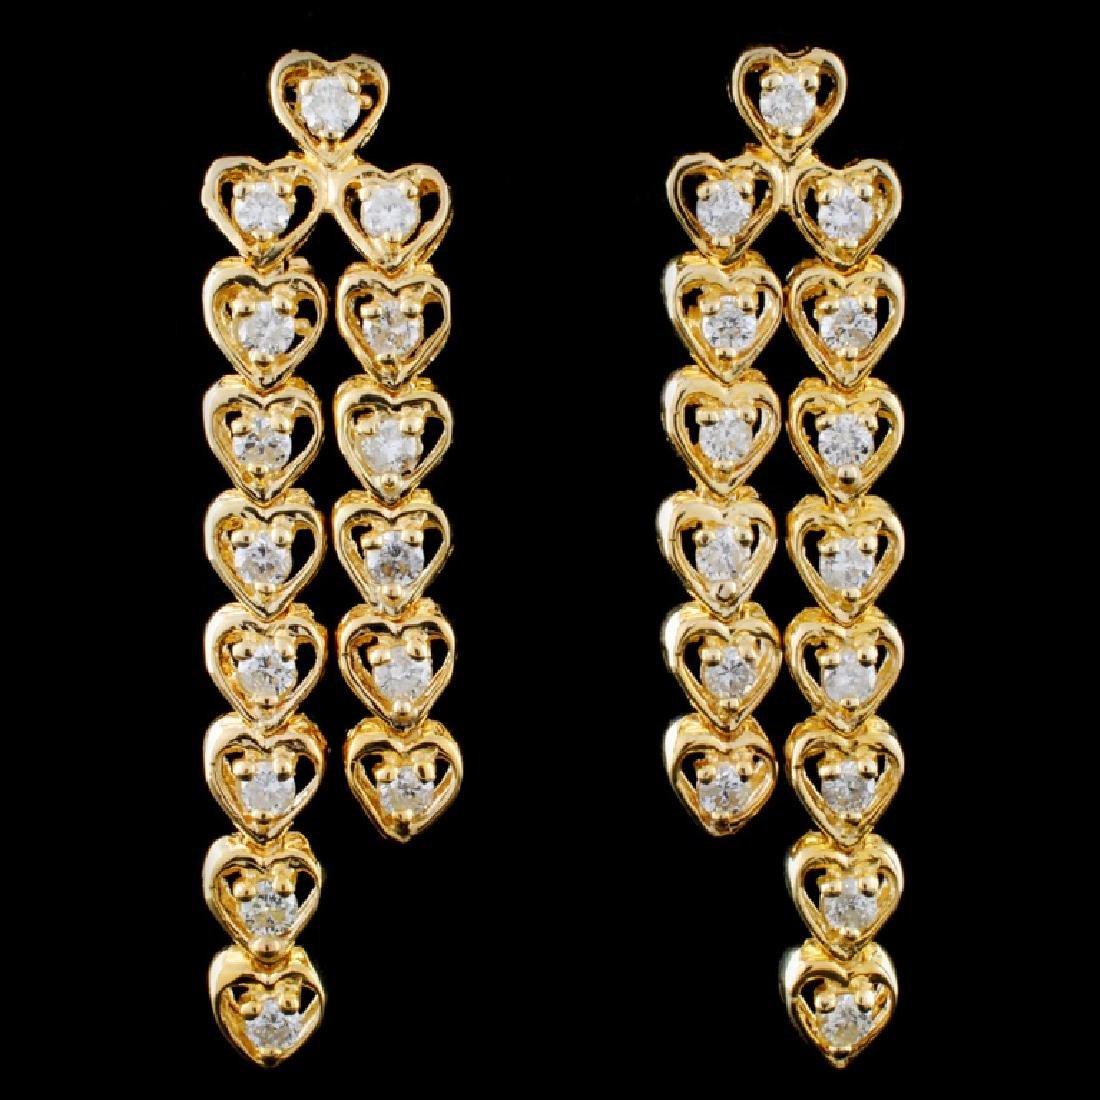 14K Yellow Gold 1.00ct Diamond Earrings